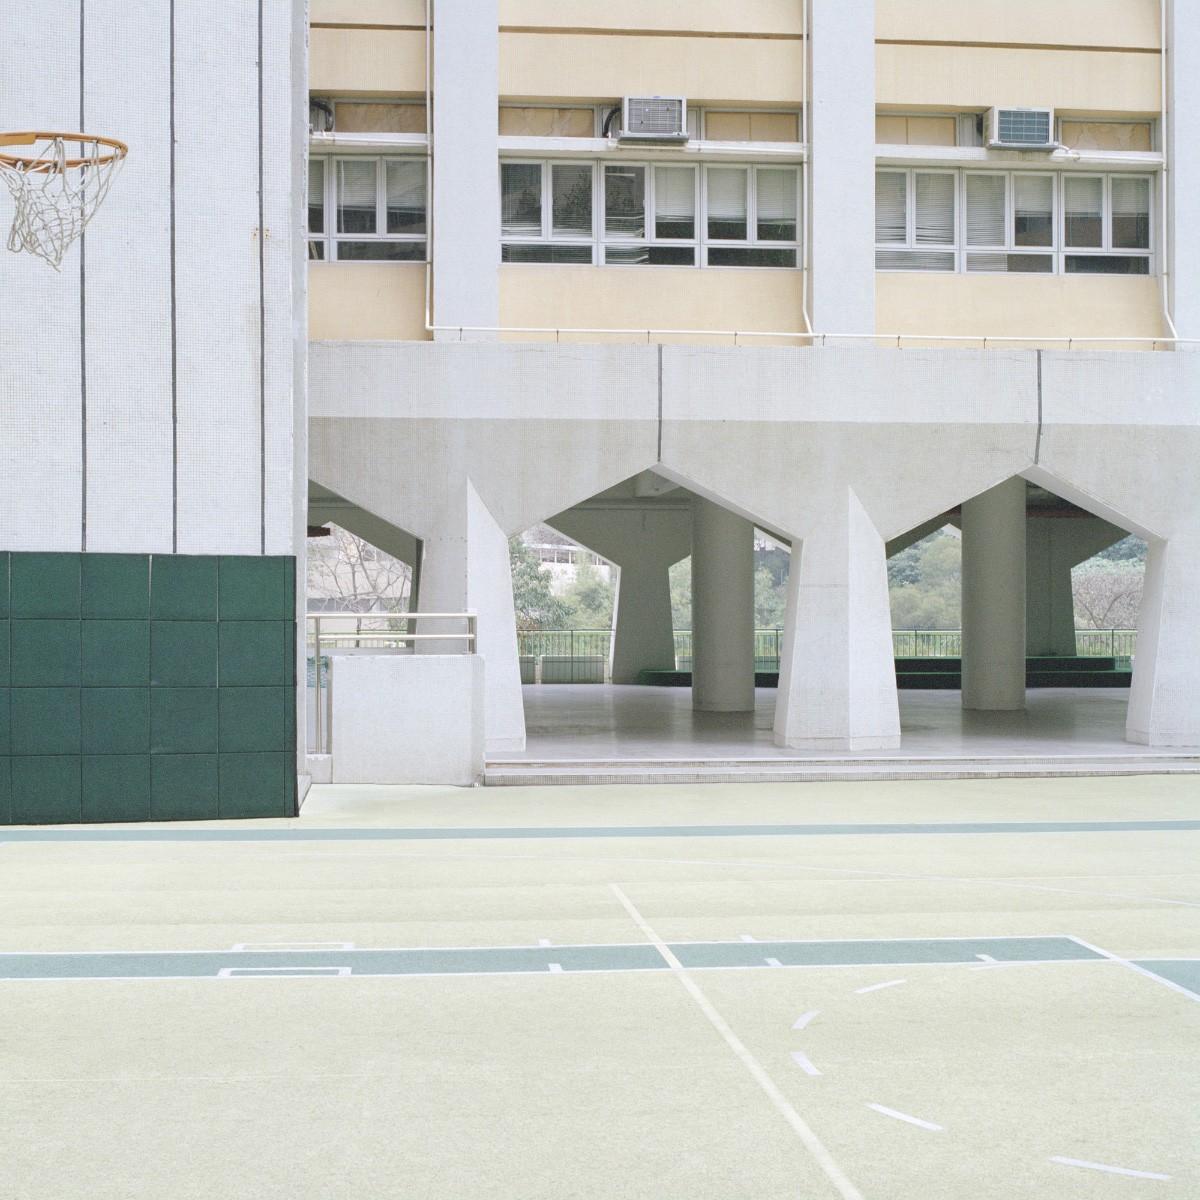 ward-roberts-courts-02.2-aff53442caef8275ceca53052f66b579